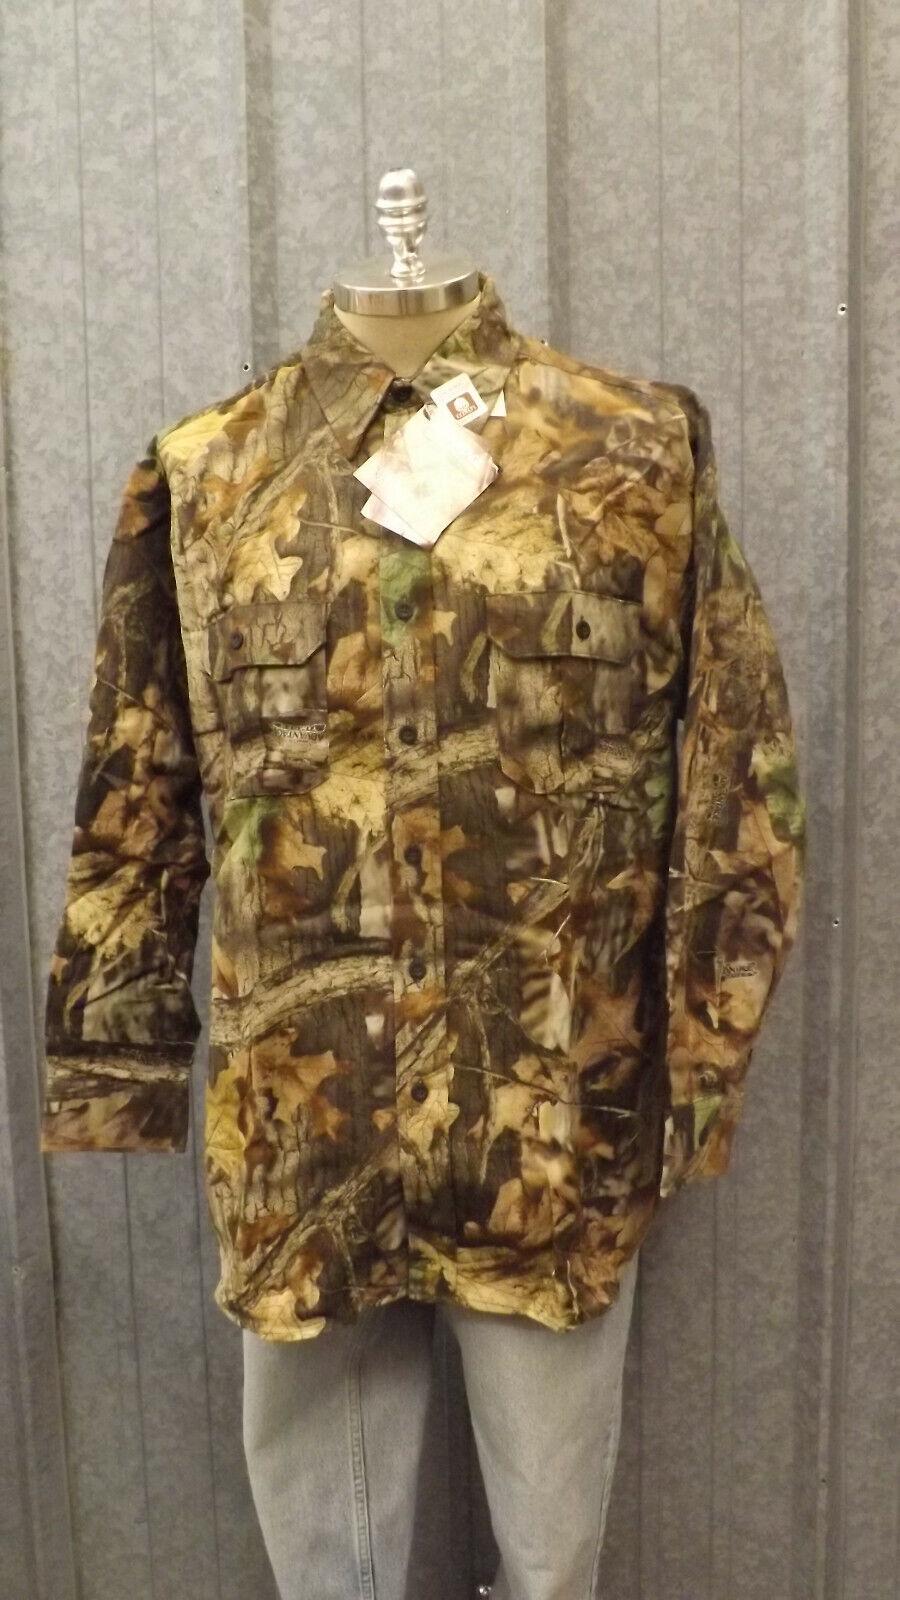 Vtg NEW Walls Realtree Timber Advantage Camo Shirt Whisper Soft Cotton sz 2XL